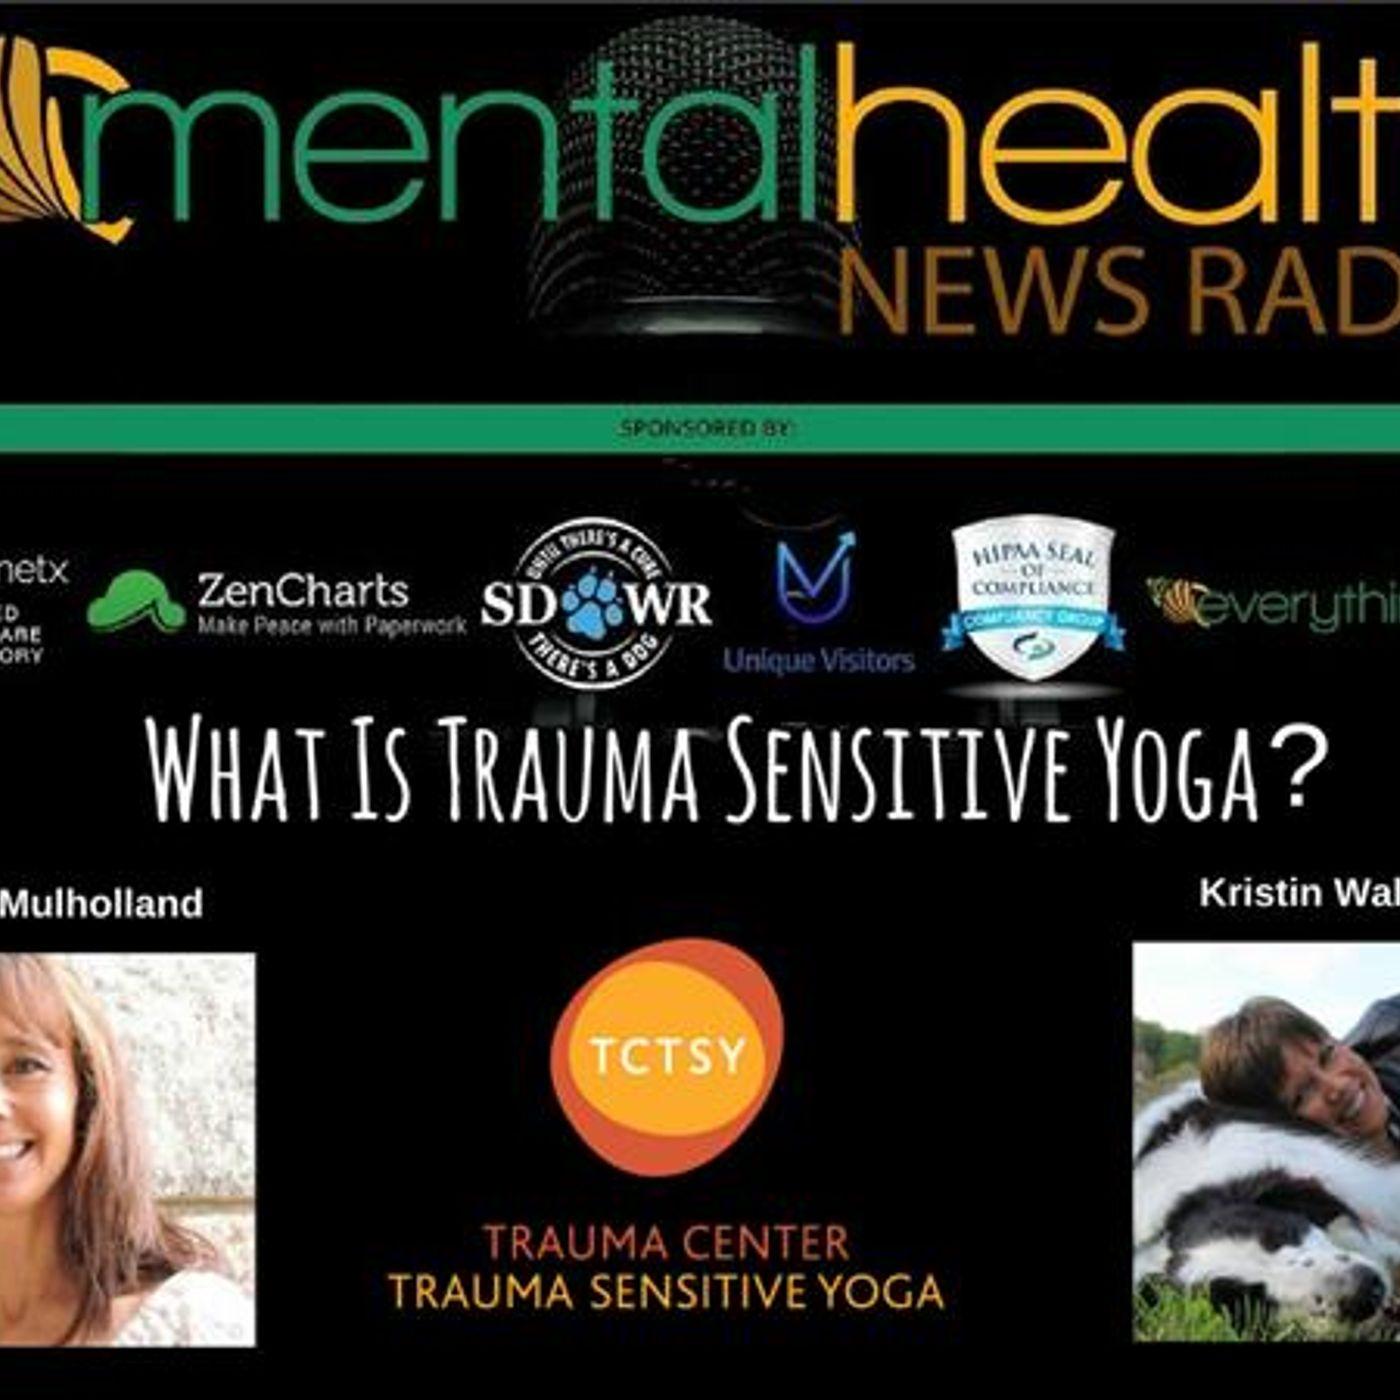 Mental Health News Radio - What Is Trauma Sensitive Yoga? Facilitator Kim Mulholland